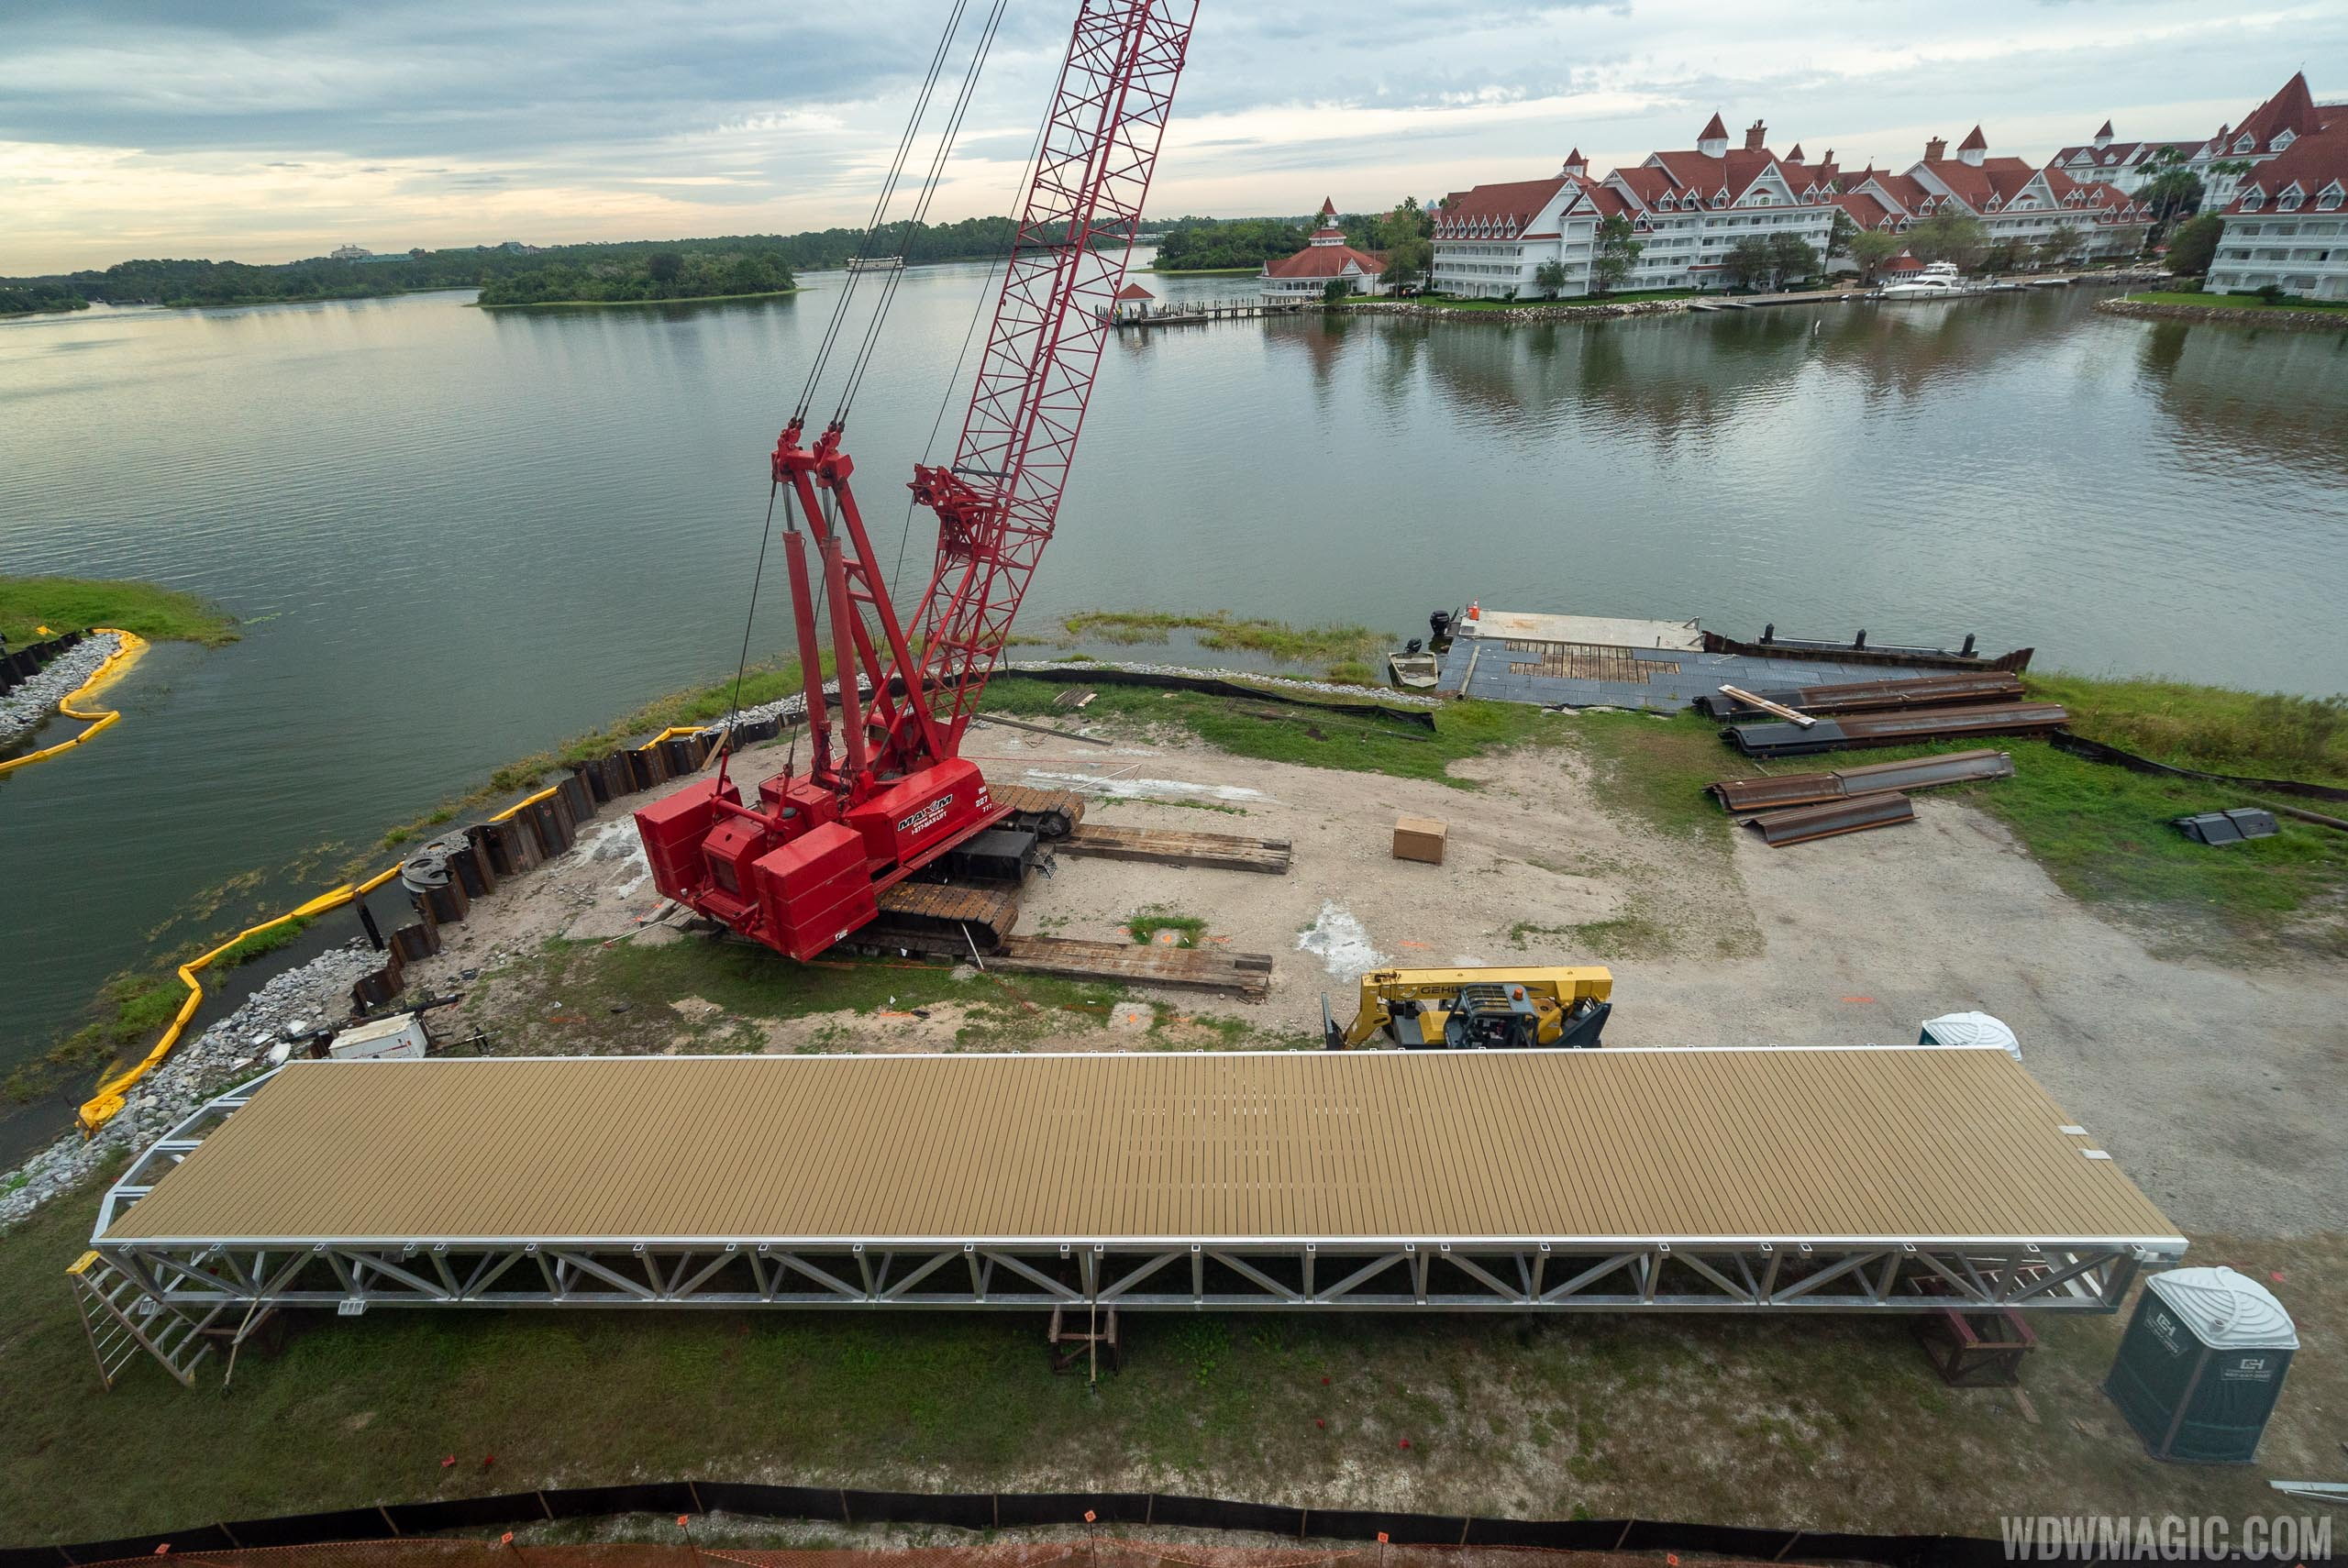 Grand Floridian to Magic Kingdom bridge construction - October 2019